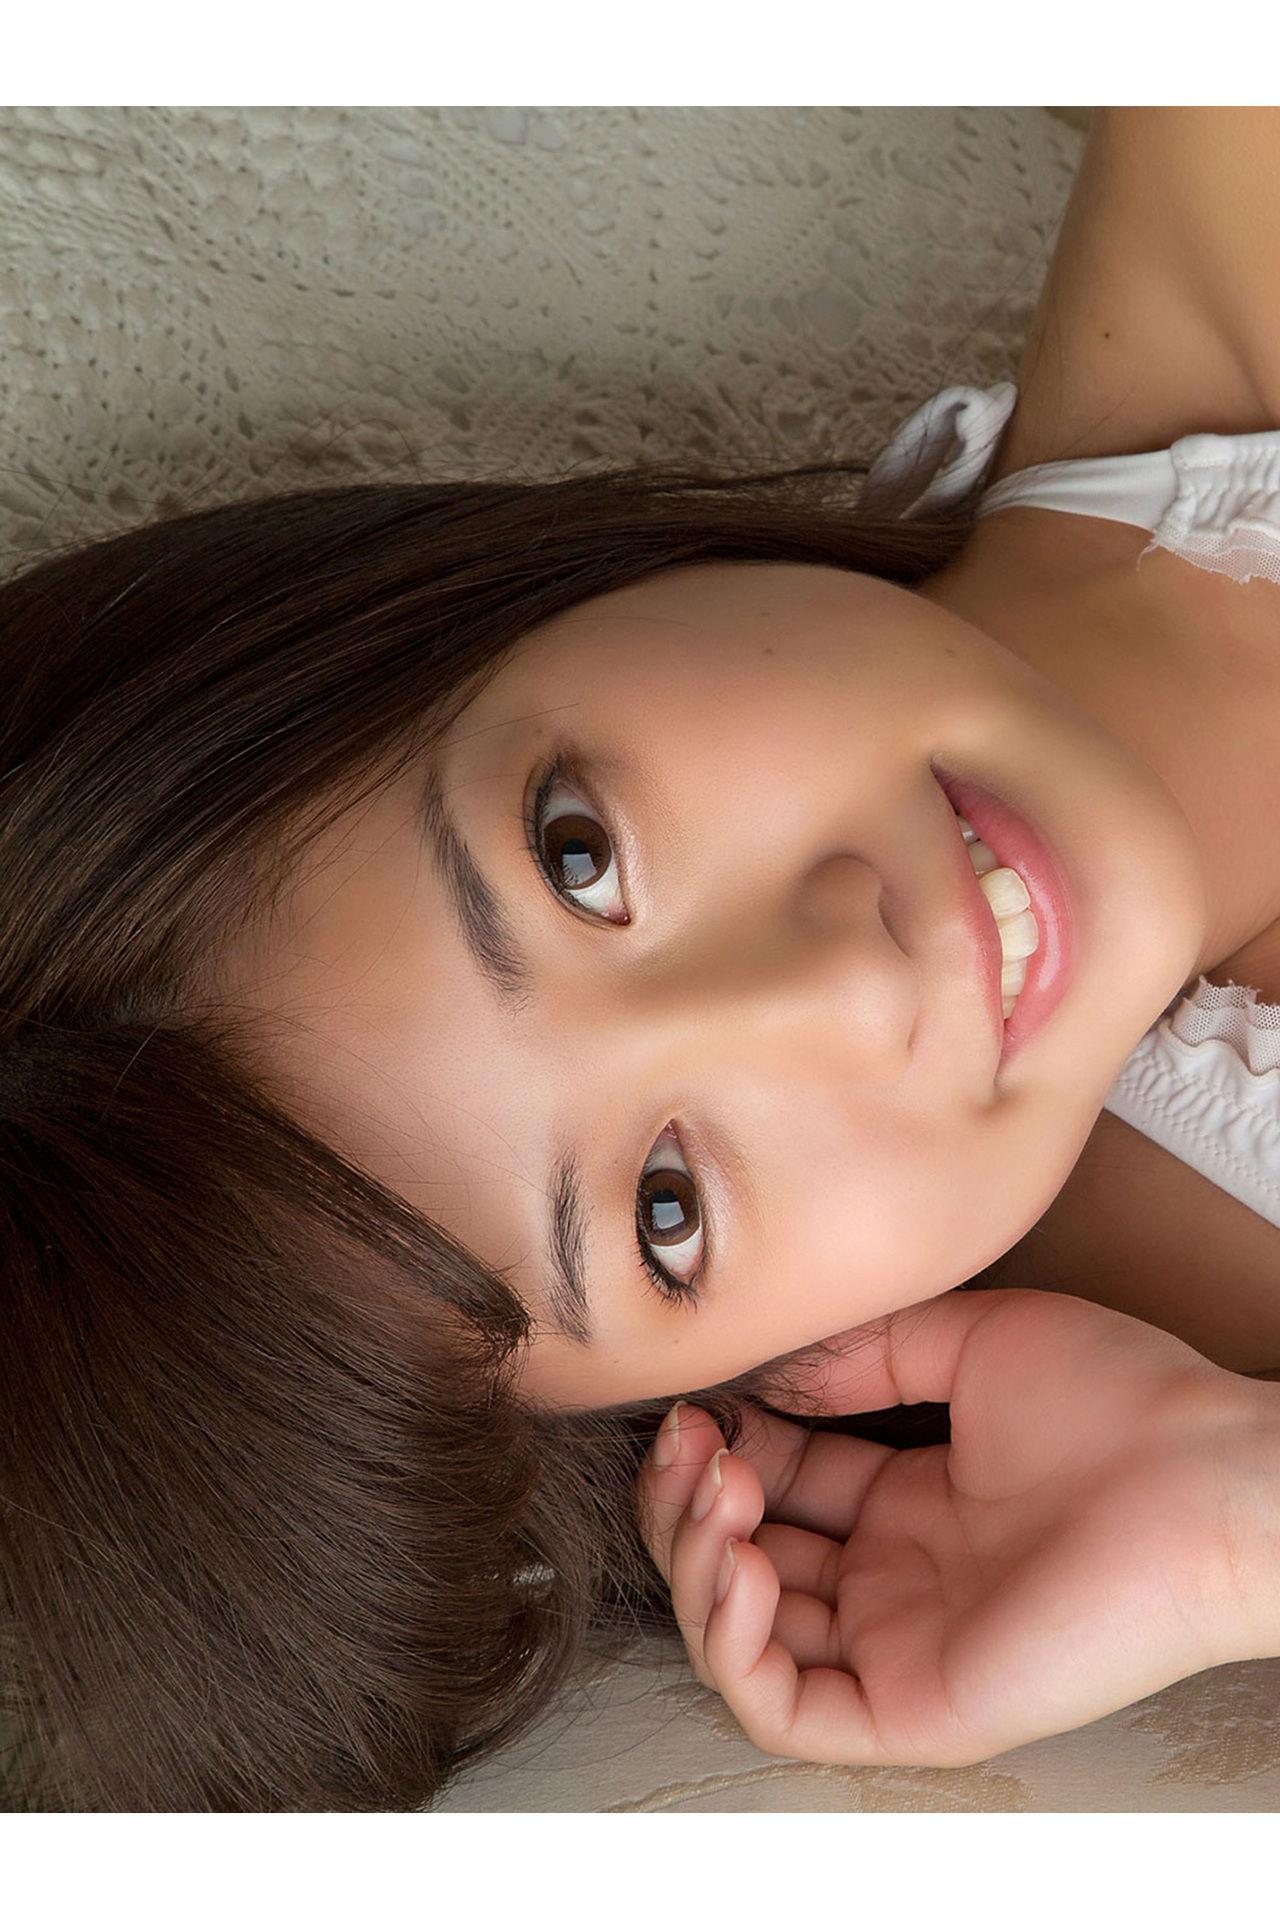 Onuki Ayaka Onuki takes off her school uniform and wears a white bikini036